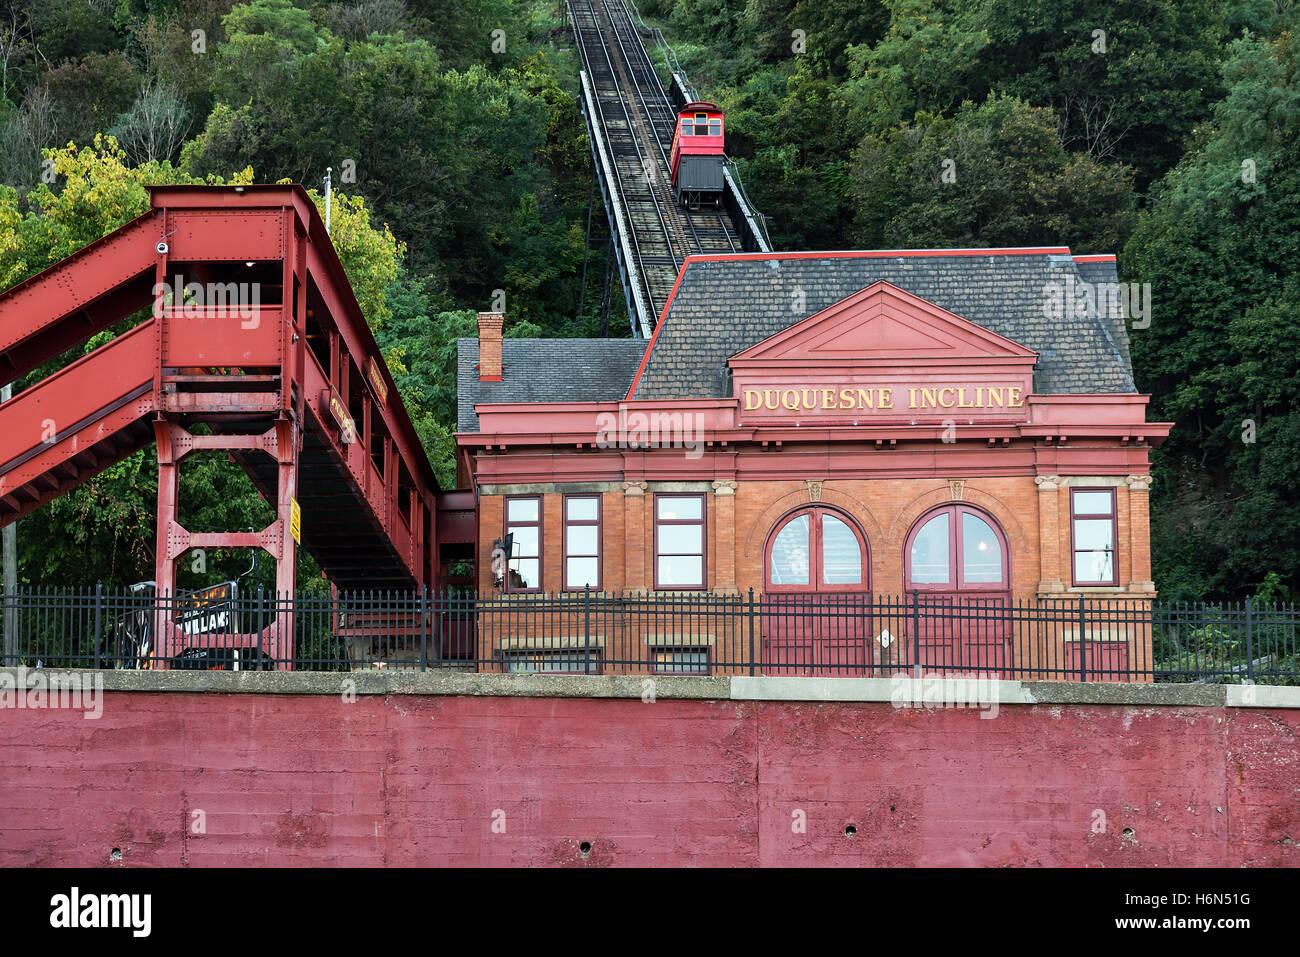 Duquesne Incline, Pittsburgh, Pennsylvania, USA. - Stock Image